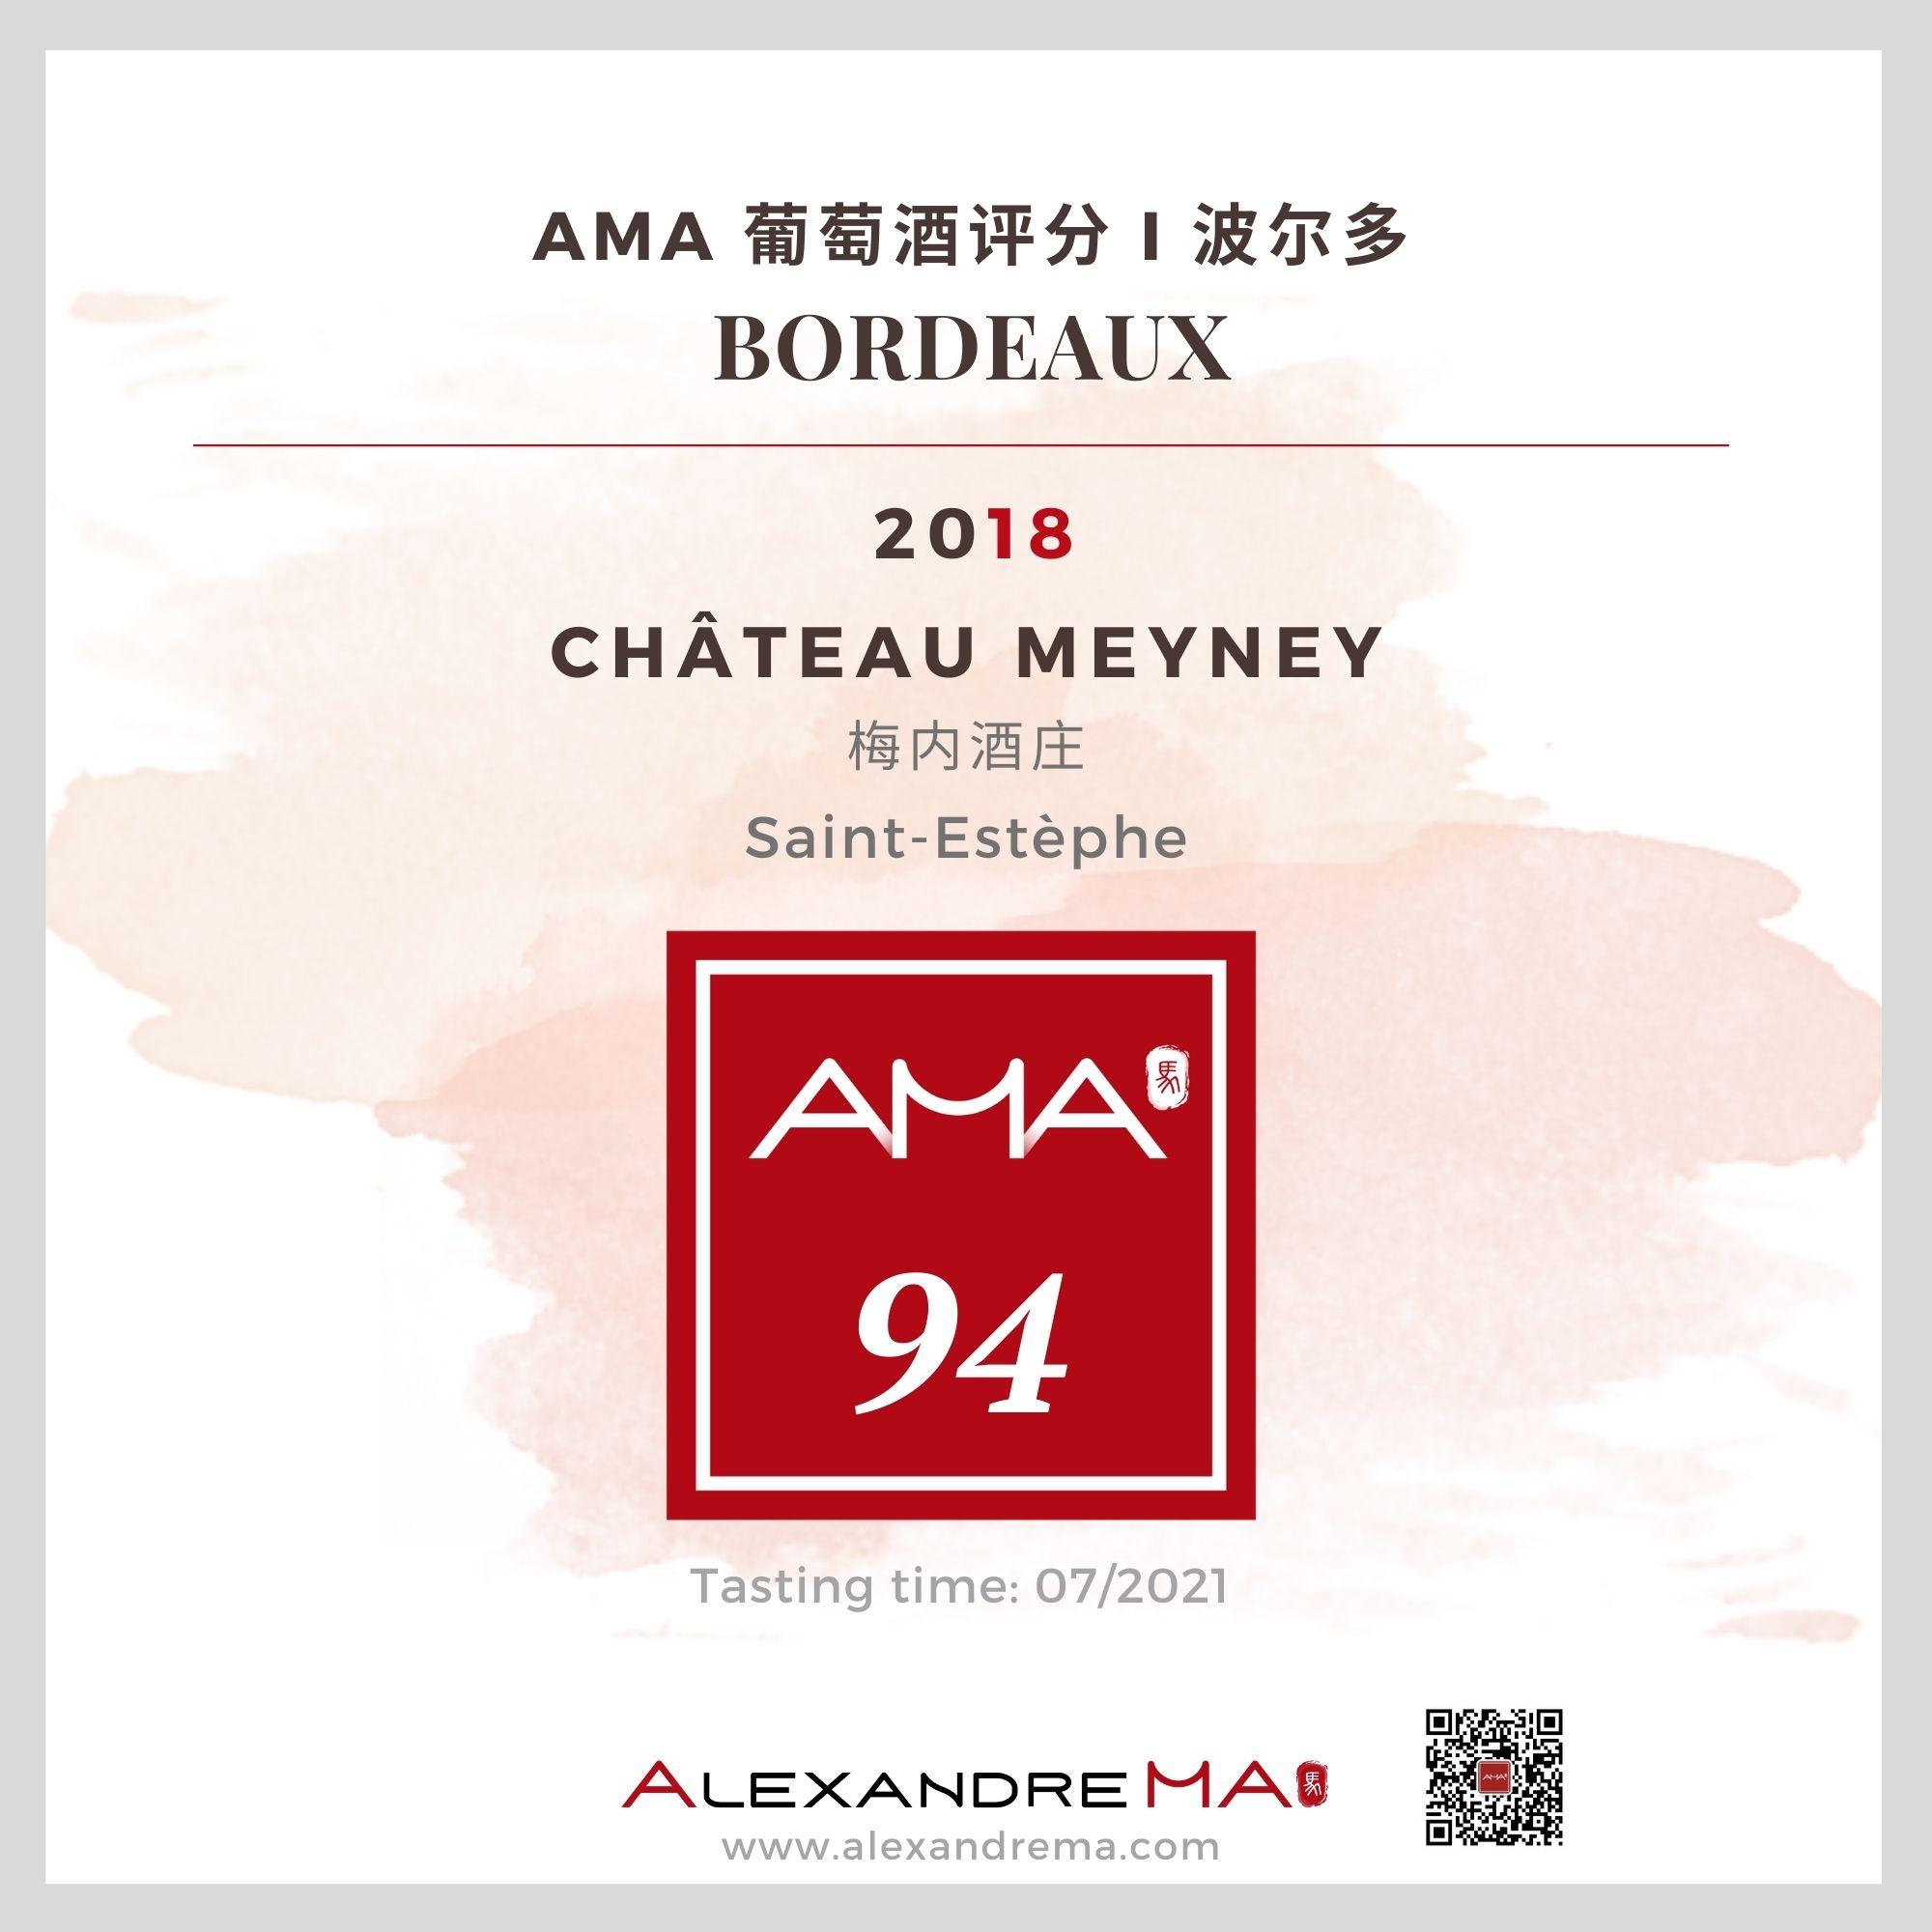 Château Meyney 2018 - Alexandre MA